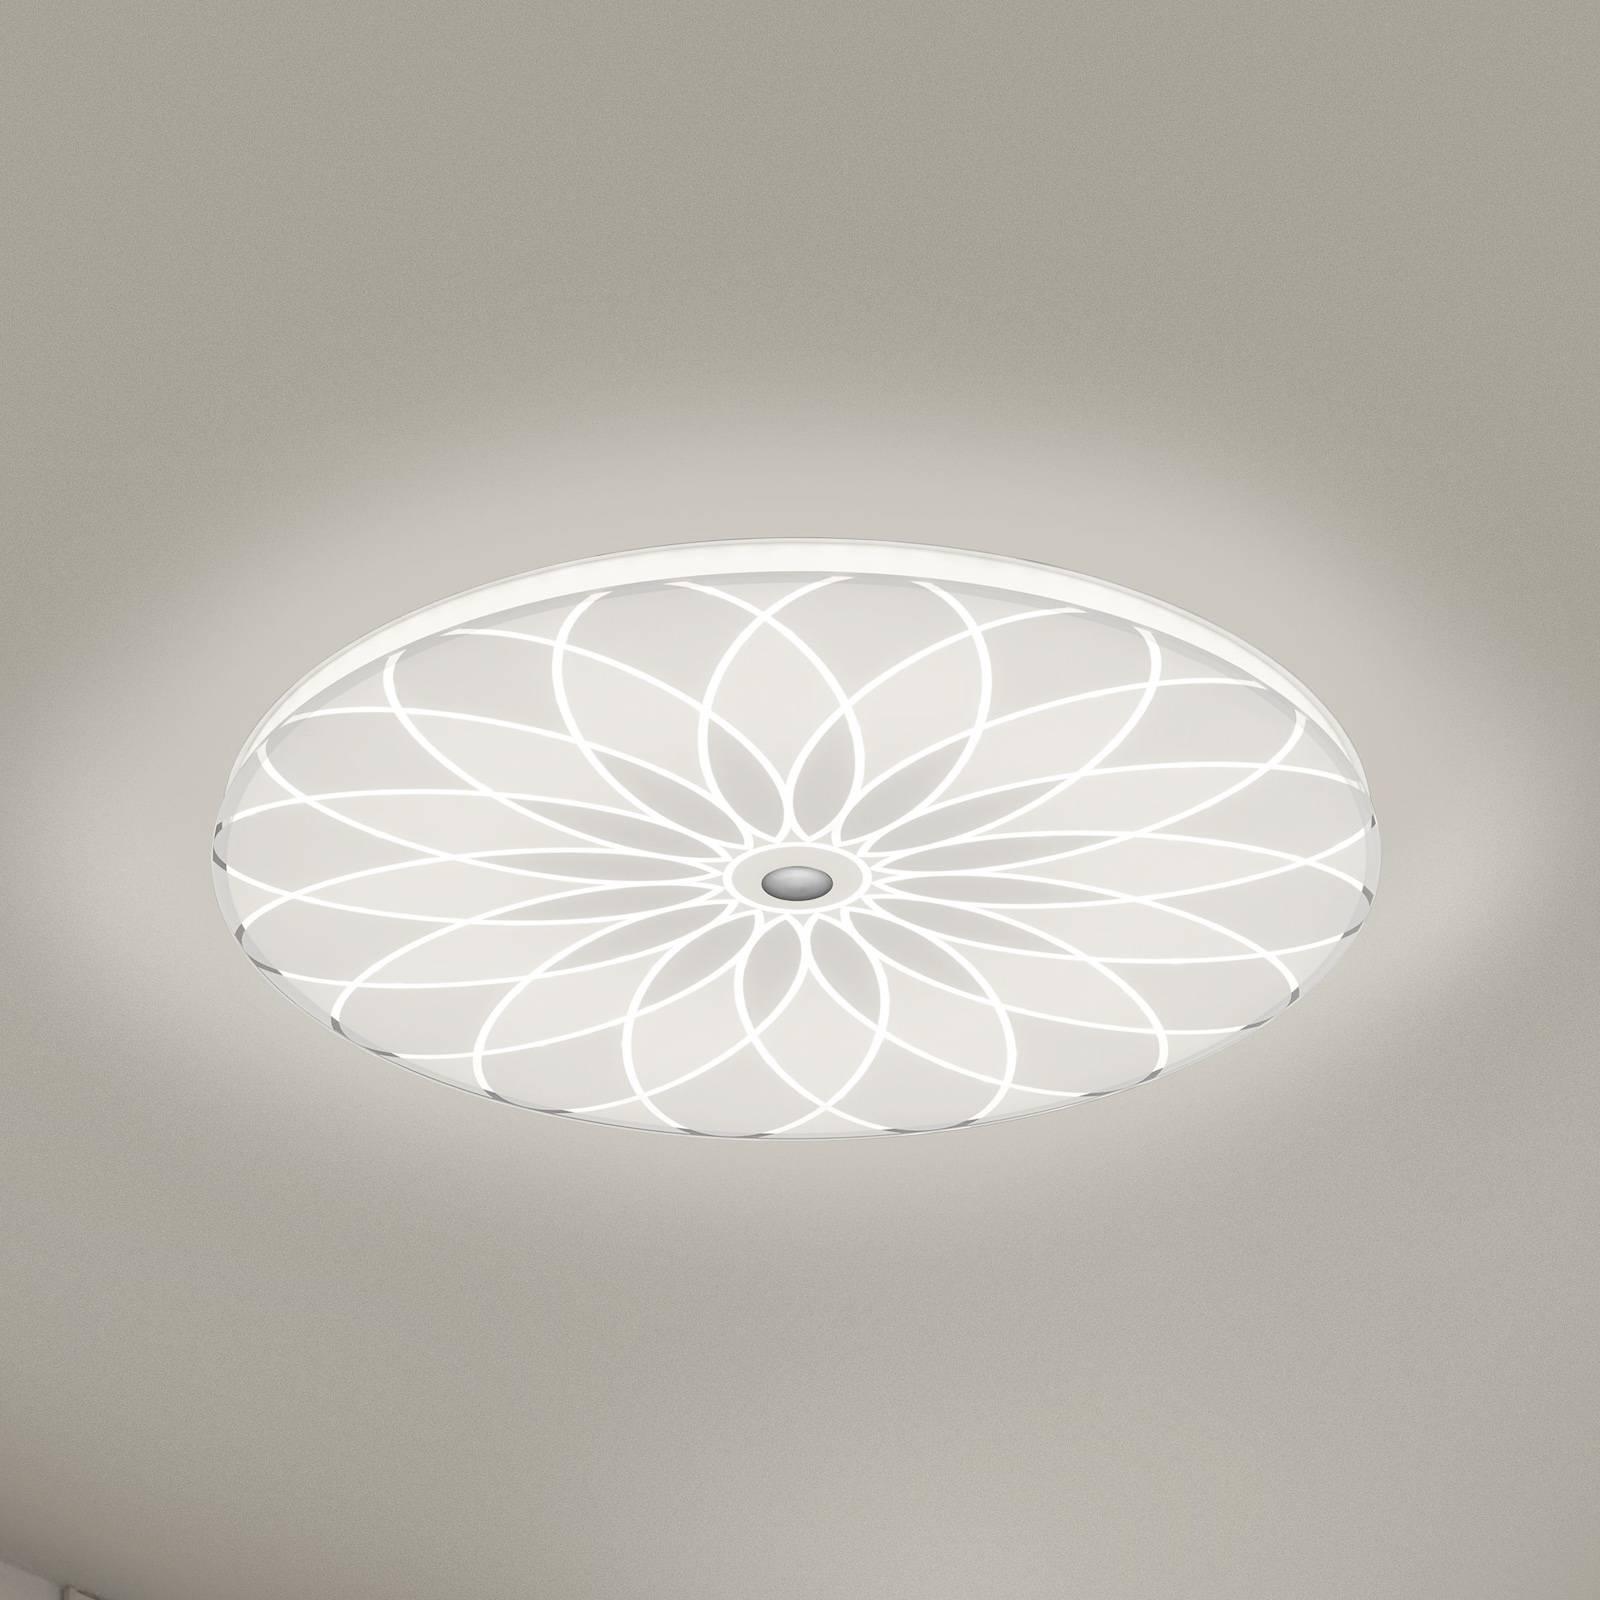 BANKAMP Mandala LED-kattovalaisin kukka, Ø 42 cm